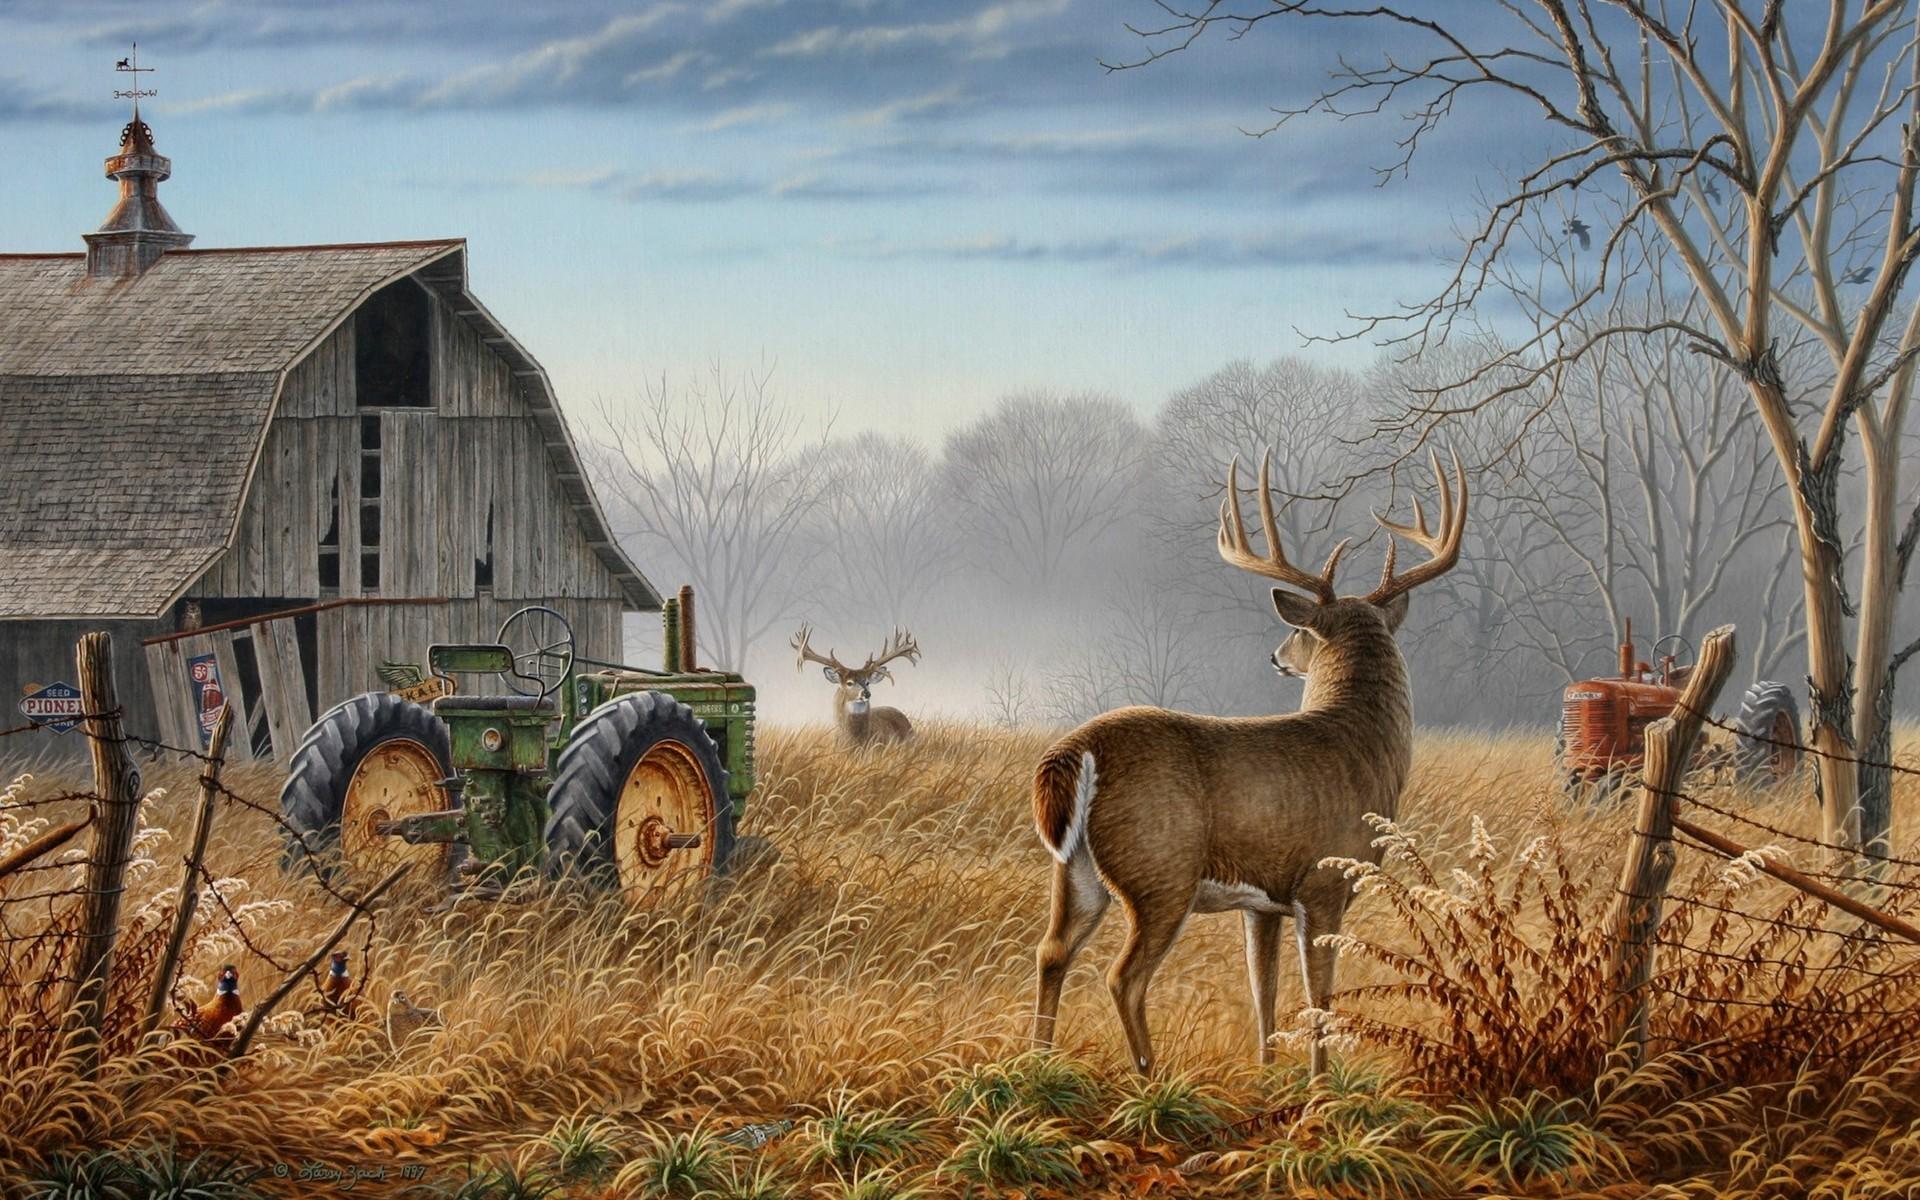 Whitetail deer screensavers – Download free 0 HTML code. Animals Tractors  Wallpaper Animals, Tractors, Artwork .